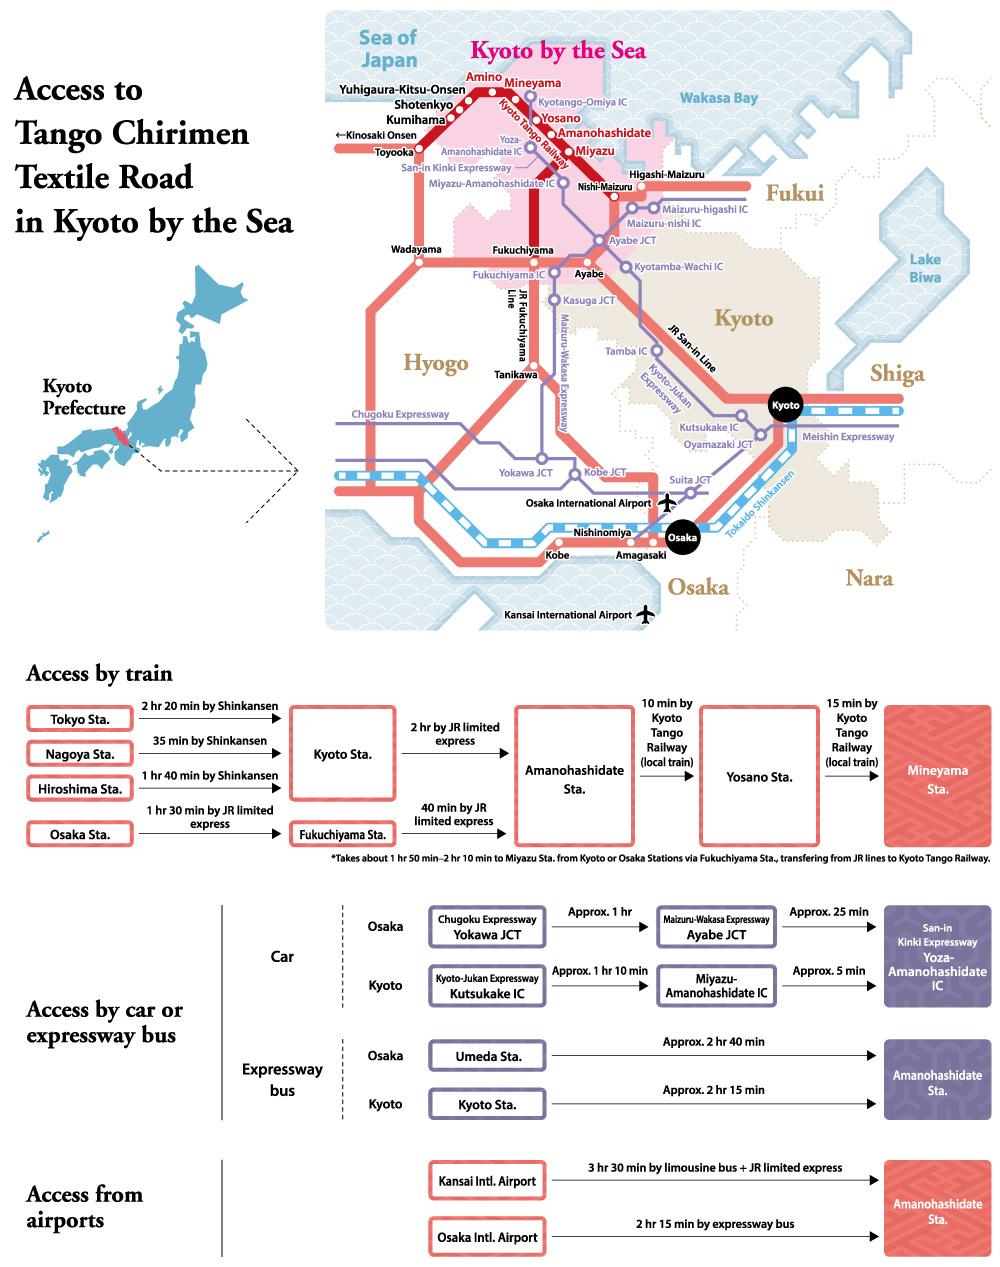 Access map around Kyoto Tango Chirimen corridor of the sea